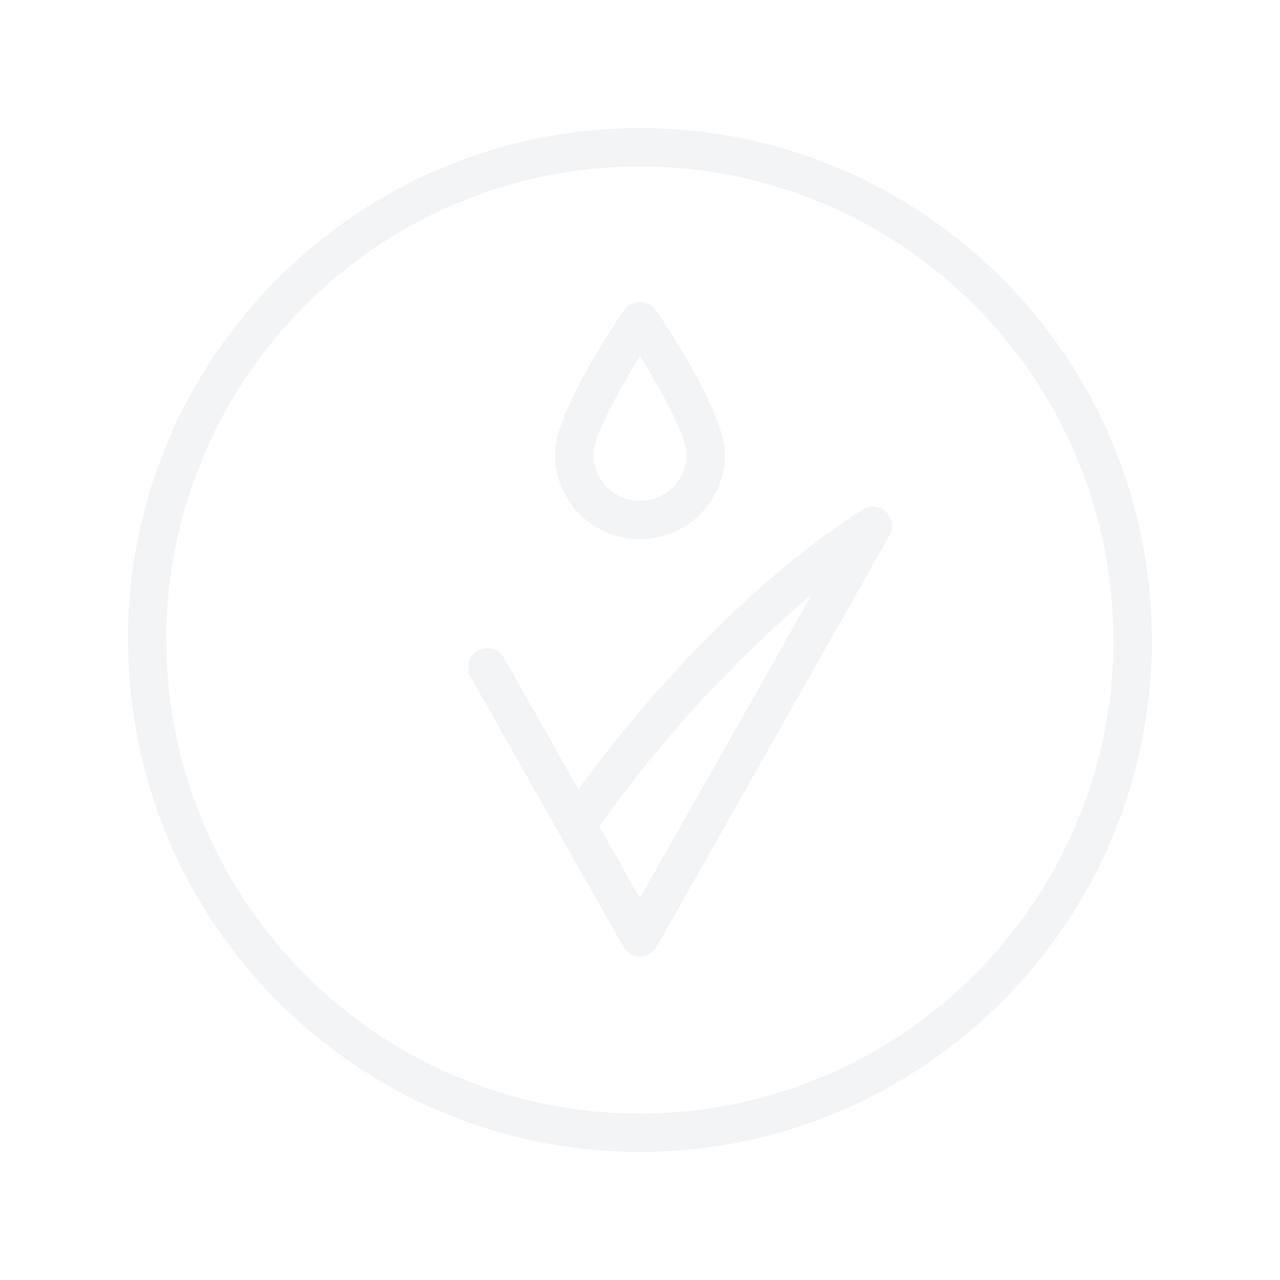 Paco Rabanne 1 Million Deodorant Spray 150ml